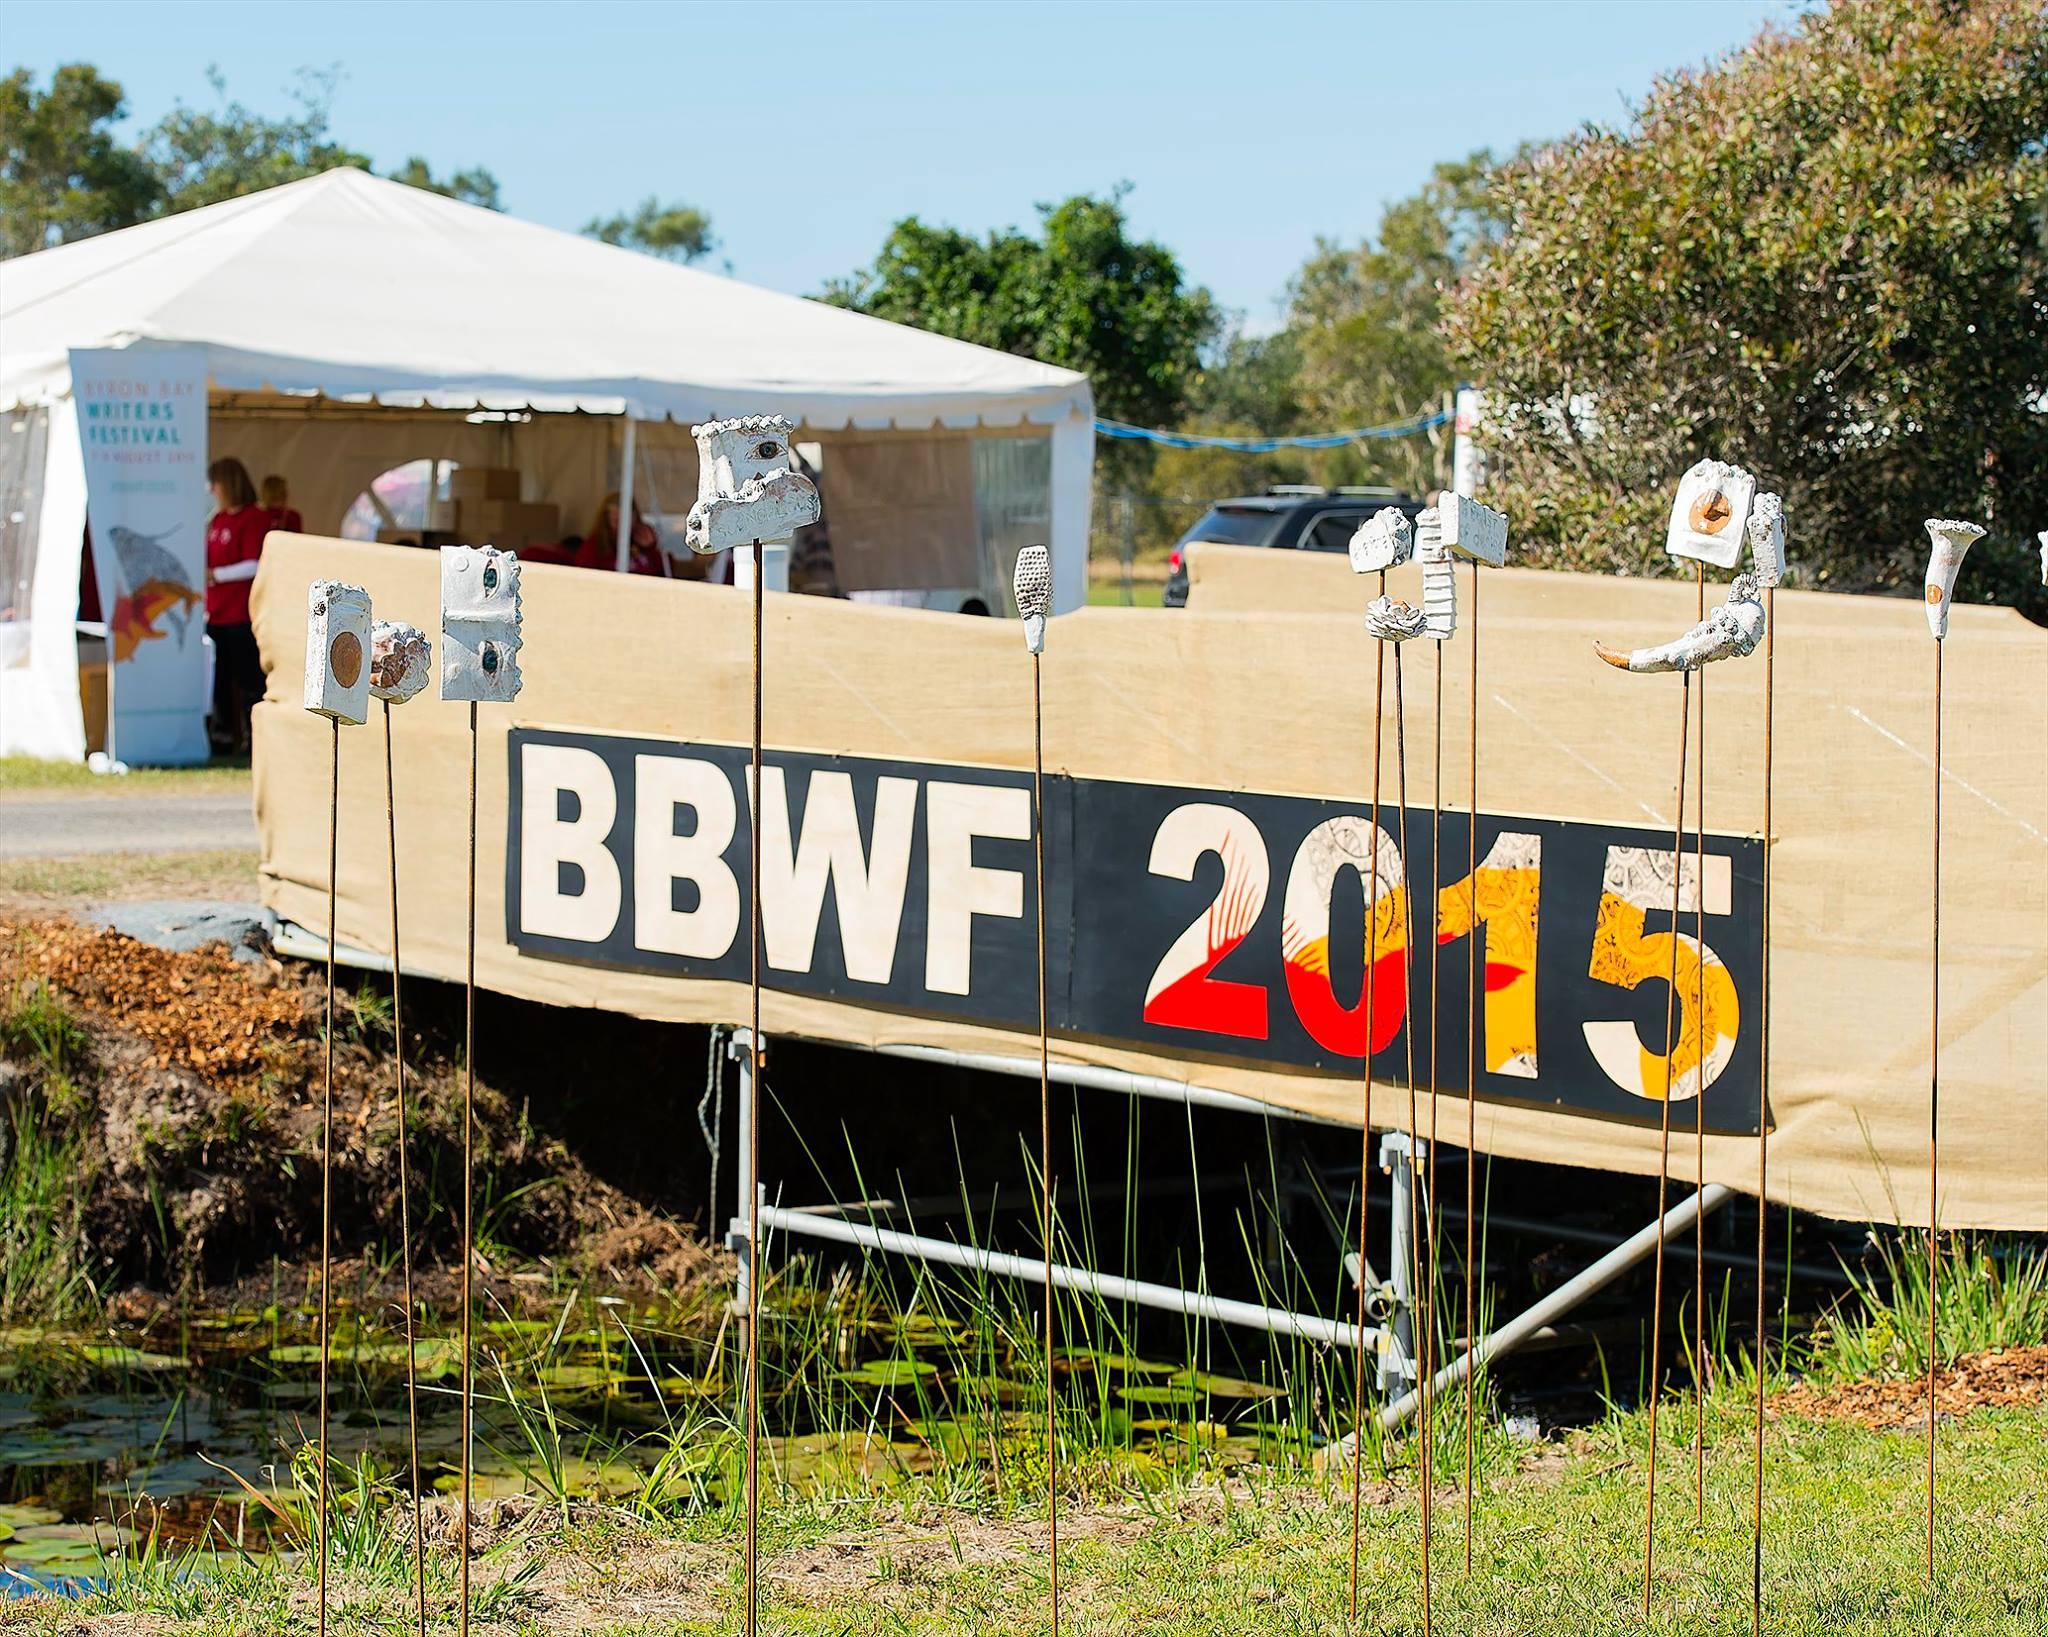 BBWF2015